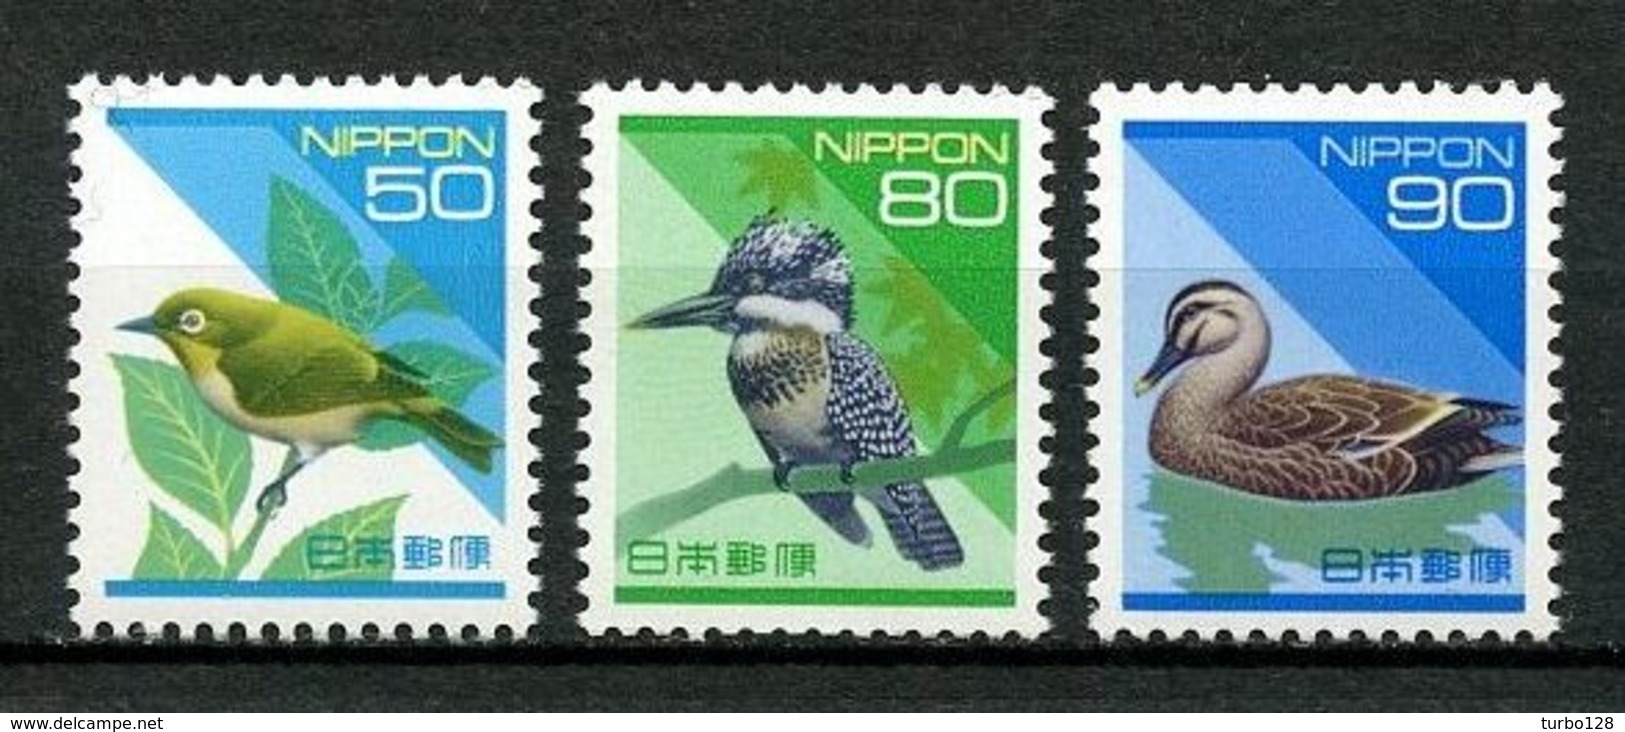 JAPON 1993 N° 2079/2081 ** Neufs MNH Superbes C 6,50 € Faune Oiseaux Passereau Canard Birds Martin Pêcheur Animaux - 1989-... Emperor Akihito (Heisei Era)